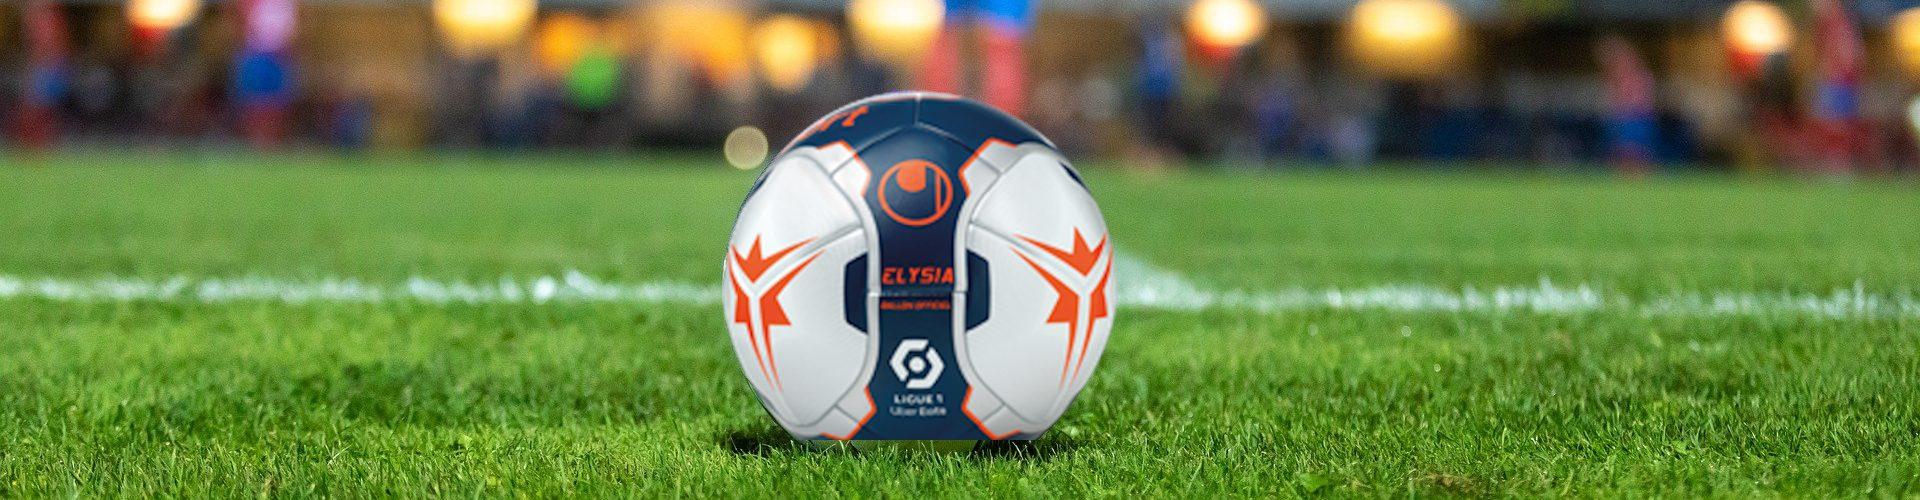 football-4505650_1920